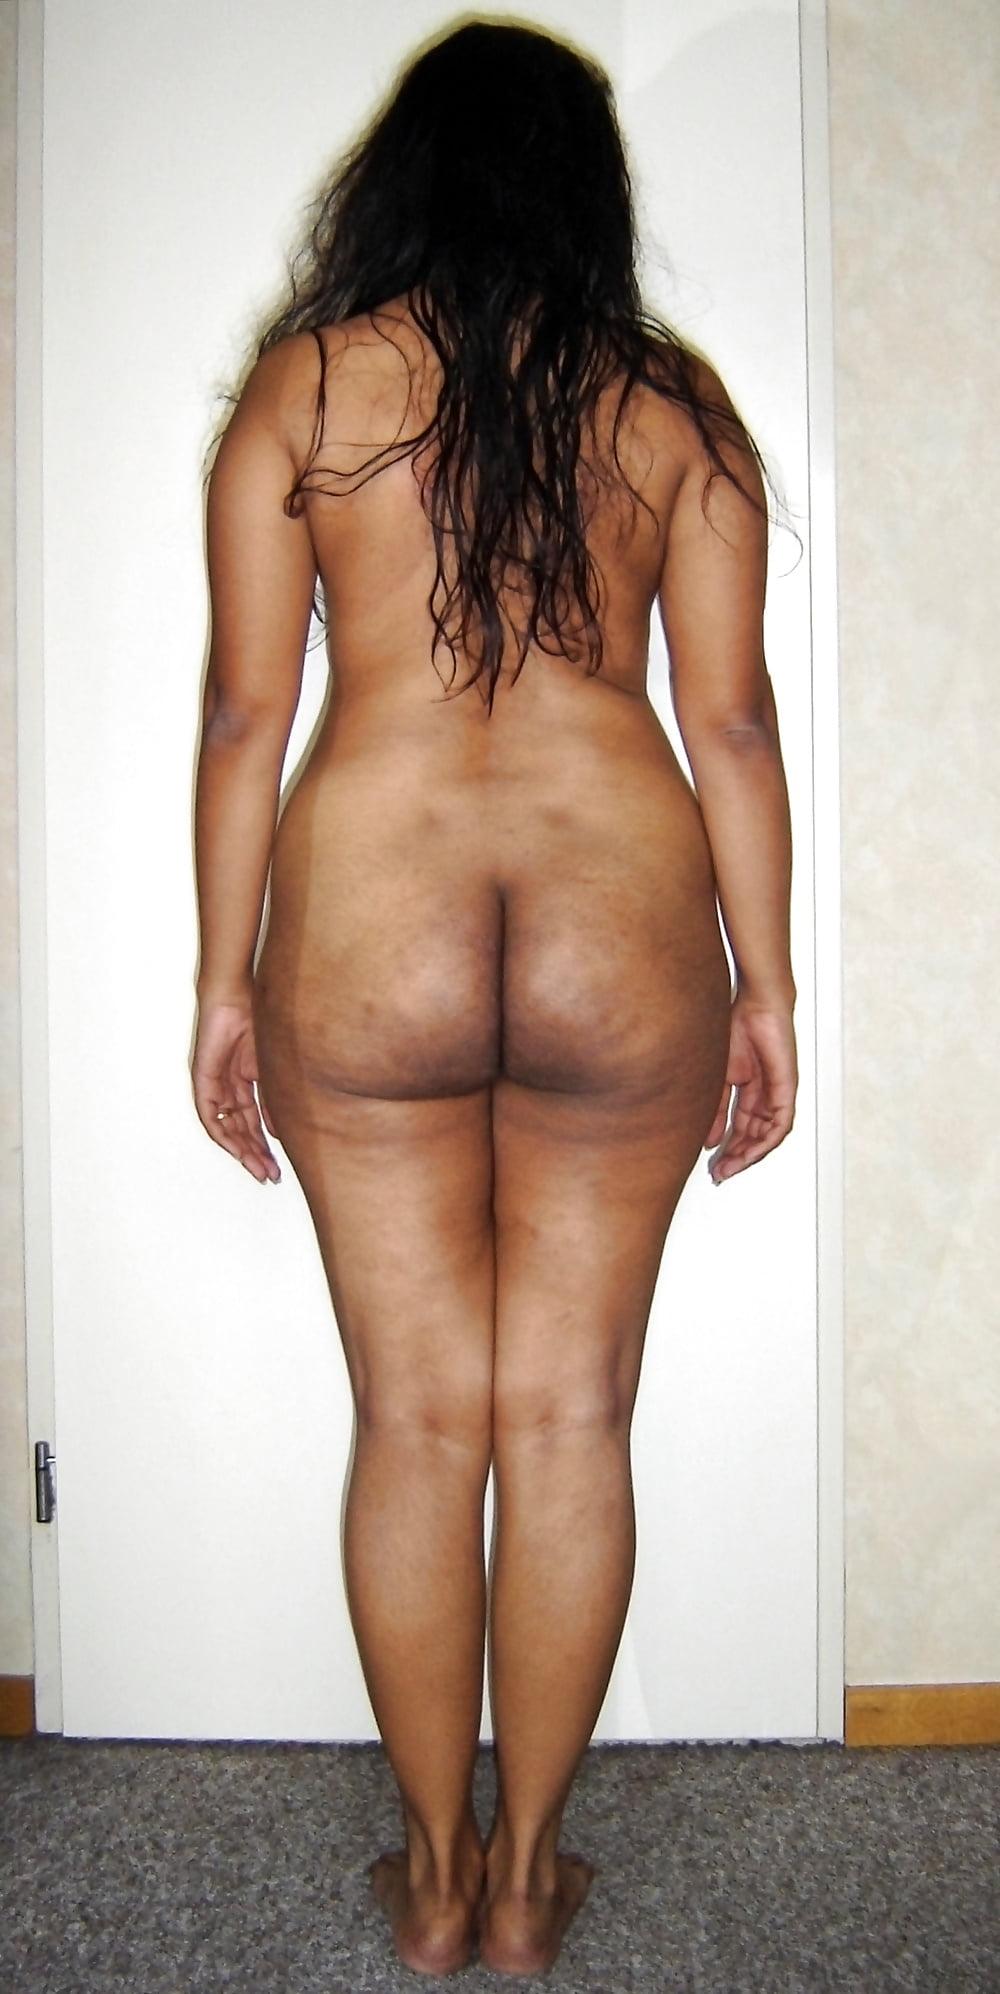 Hot female asses indian — 1